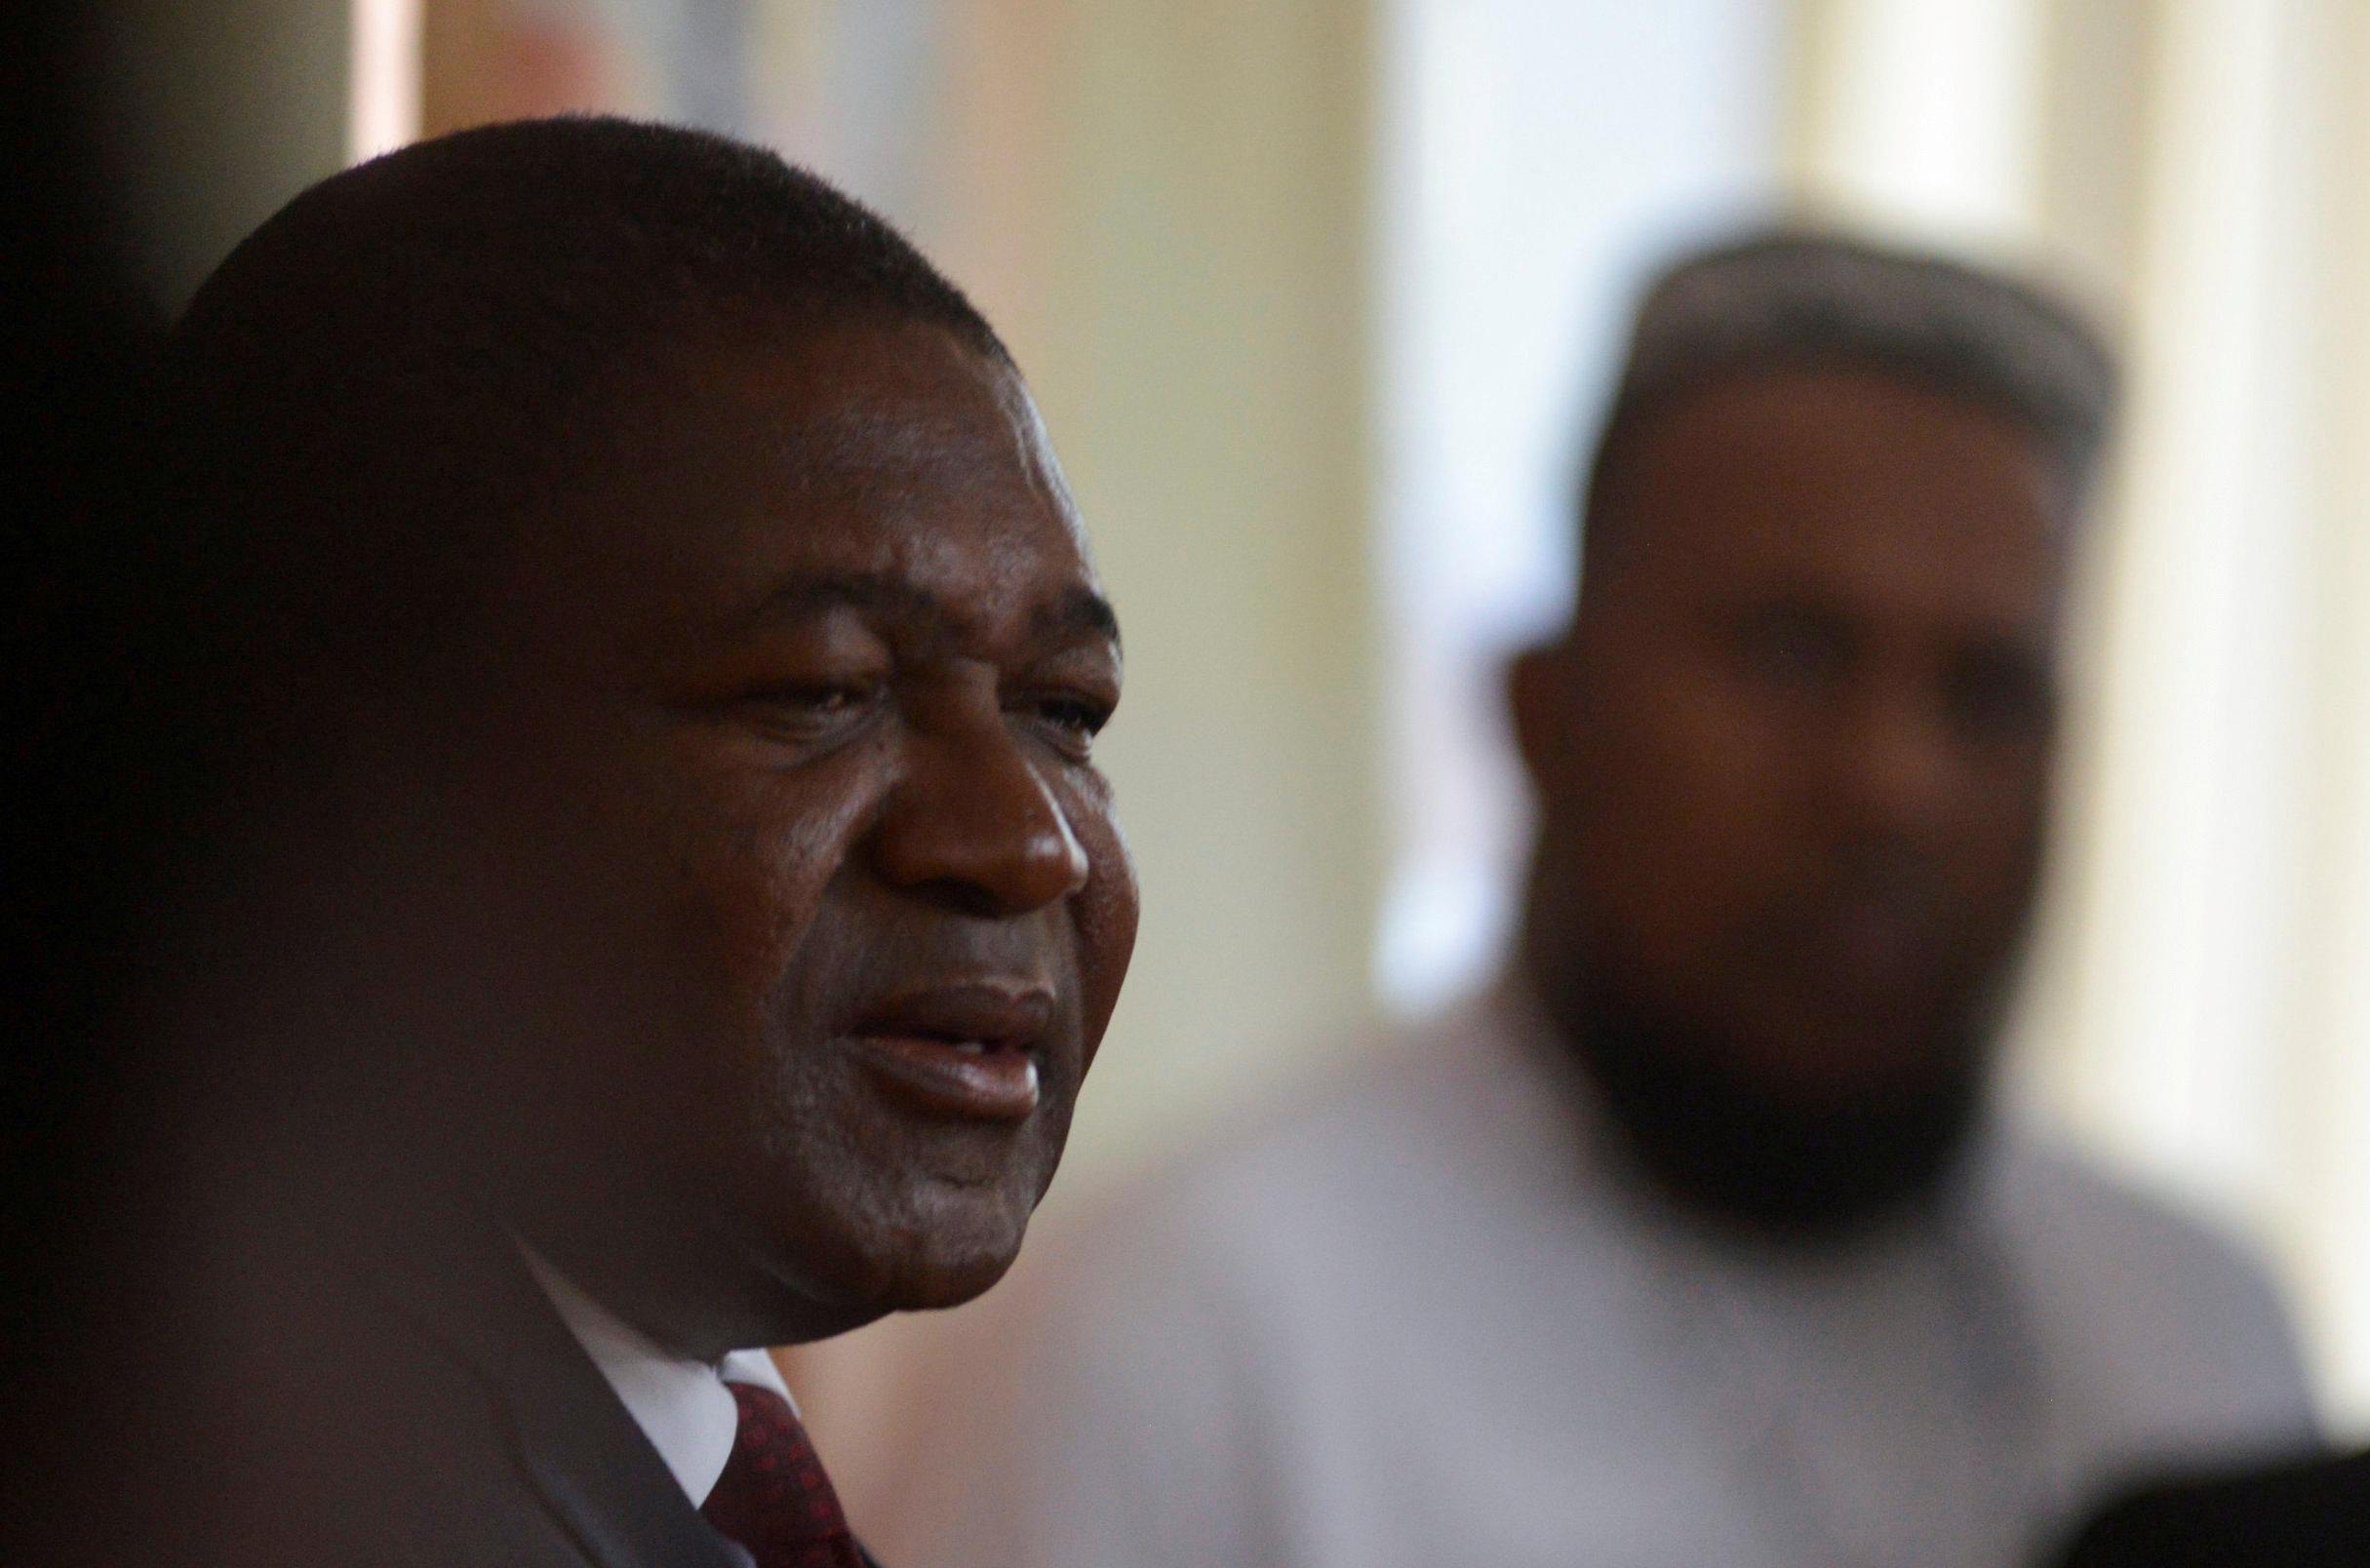 Mozambique's President Filipe Nyusi speaks with the press in Mozambique, October, 15, 2019. REUTERS/Grant Lee Neuenburg